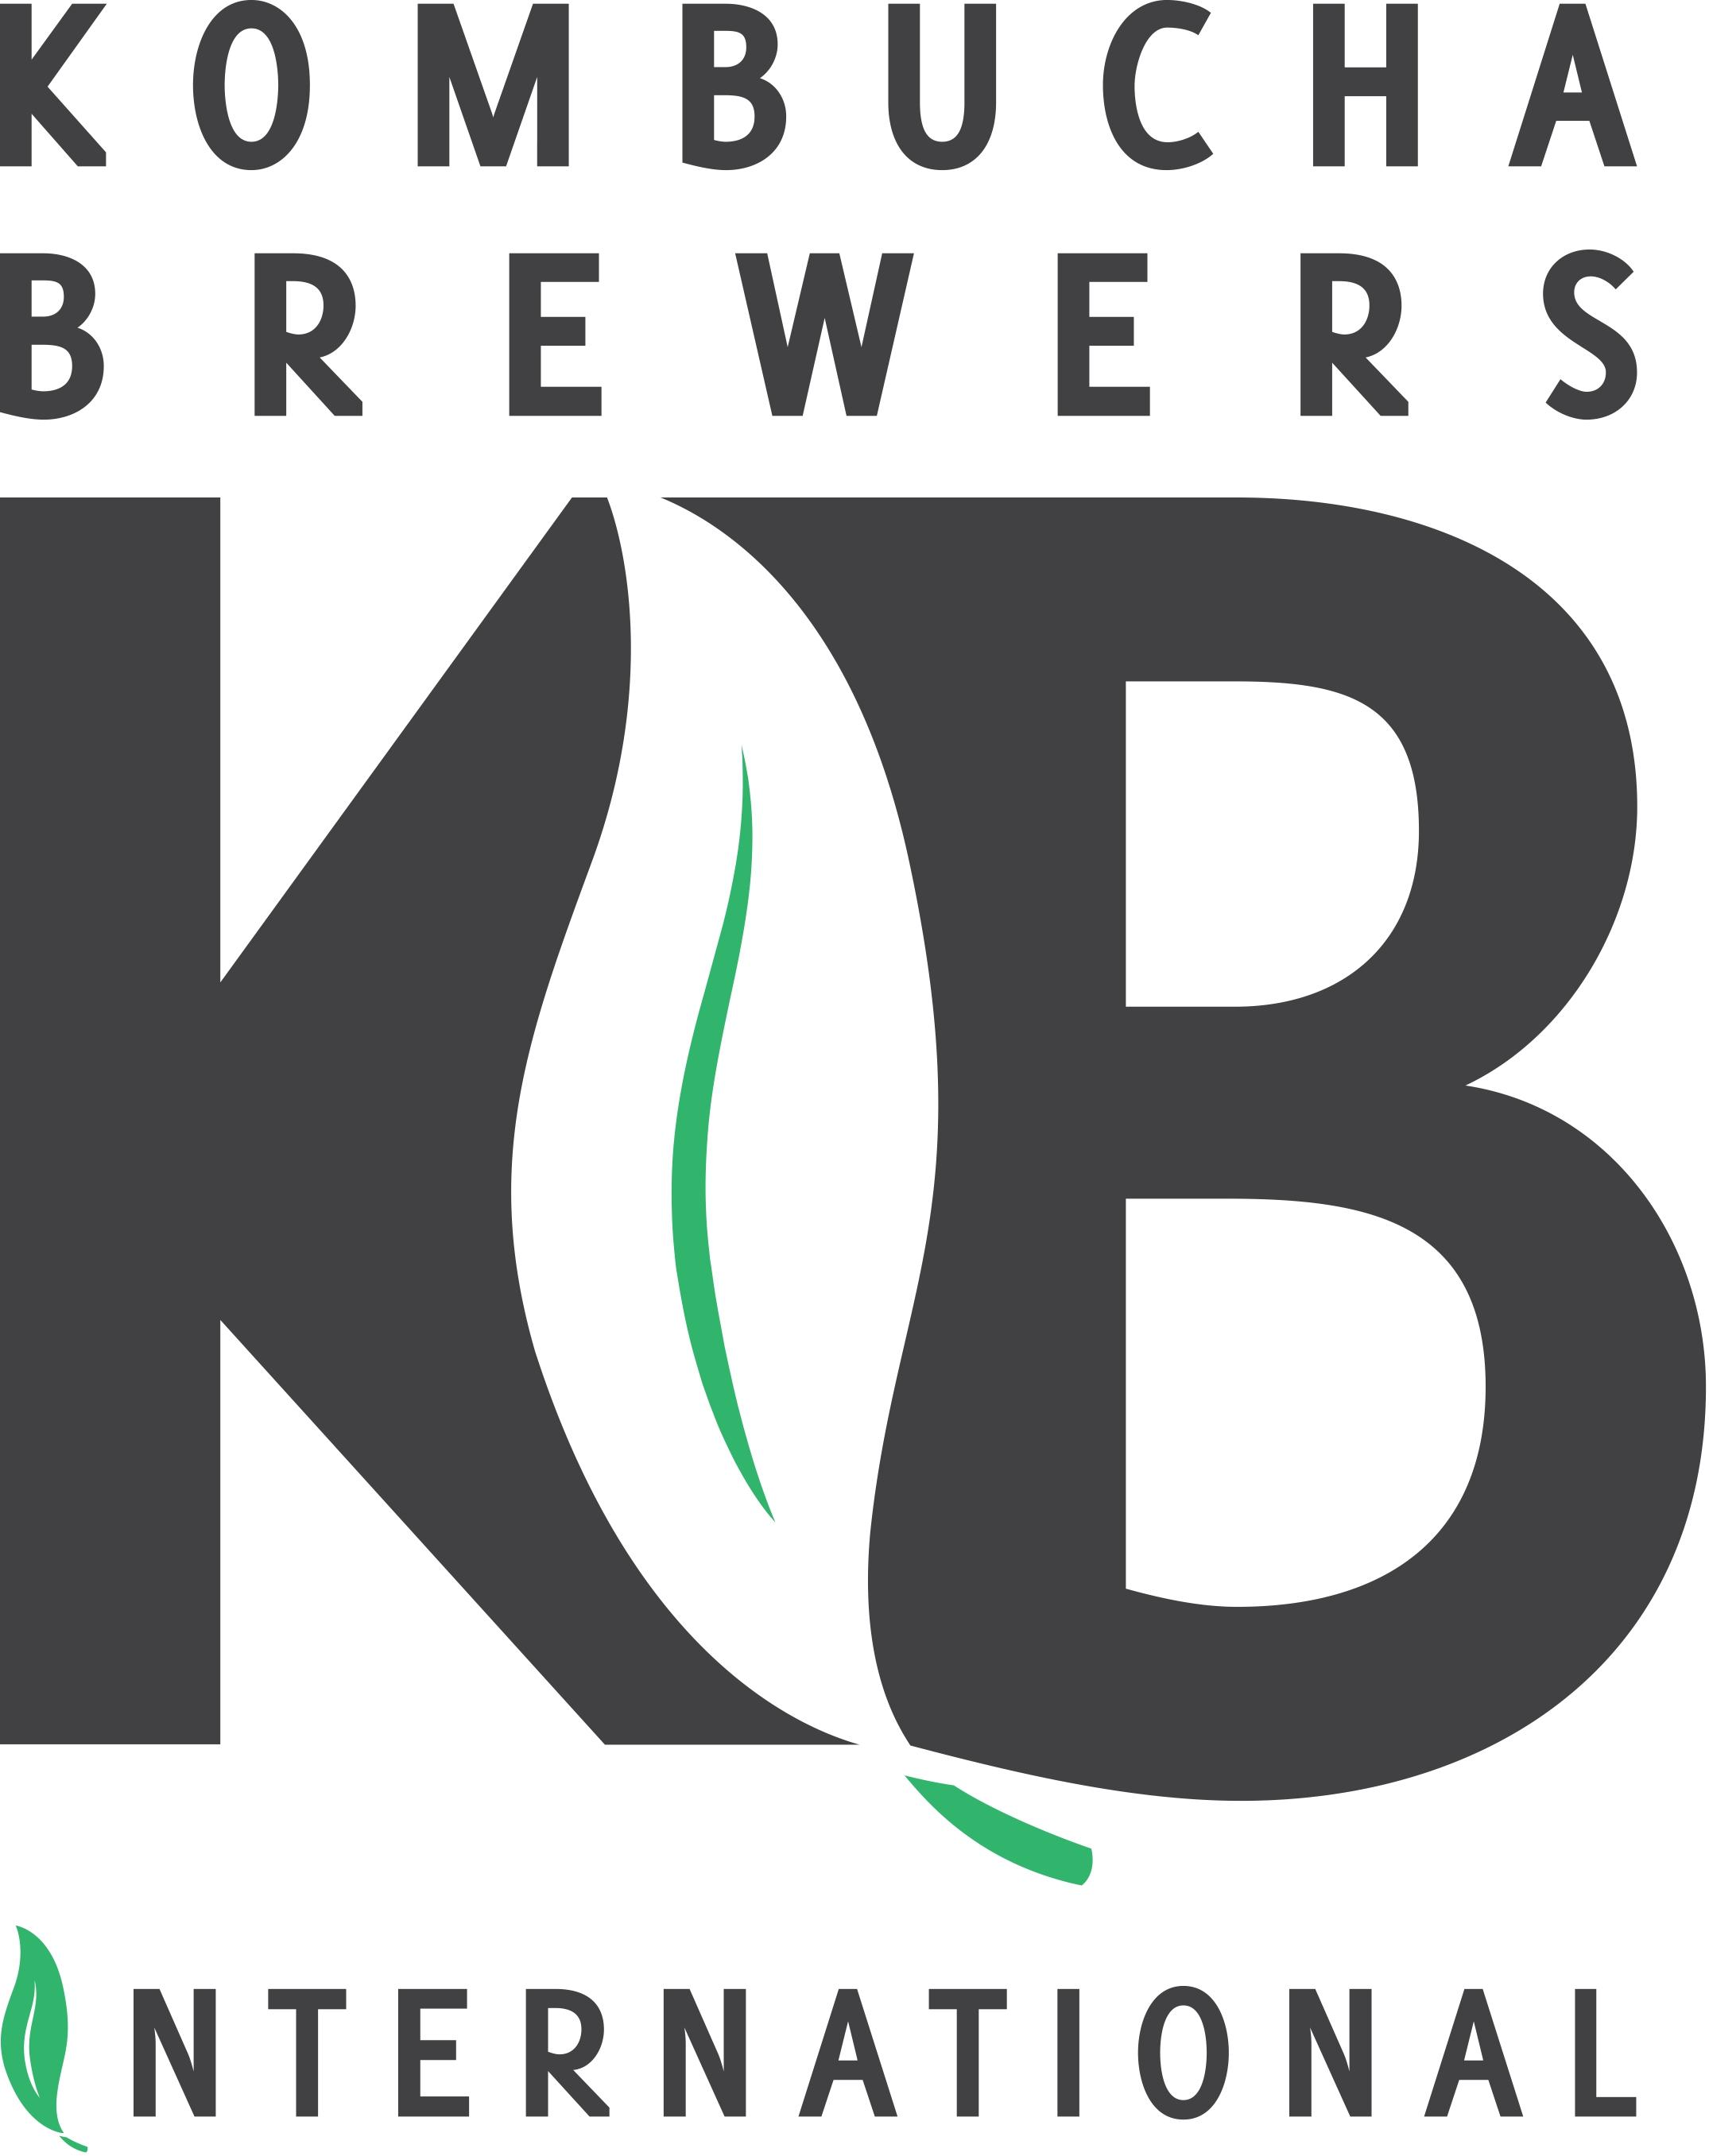 Kombucha Brewers International logo_square